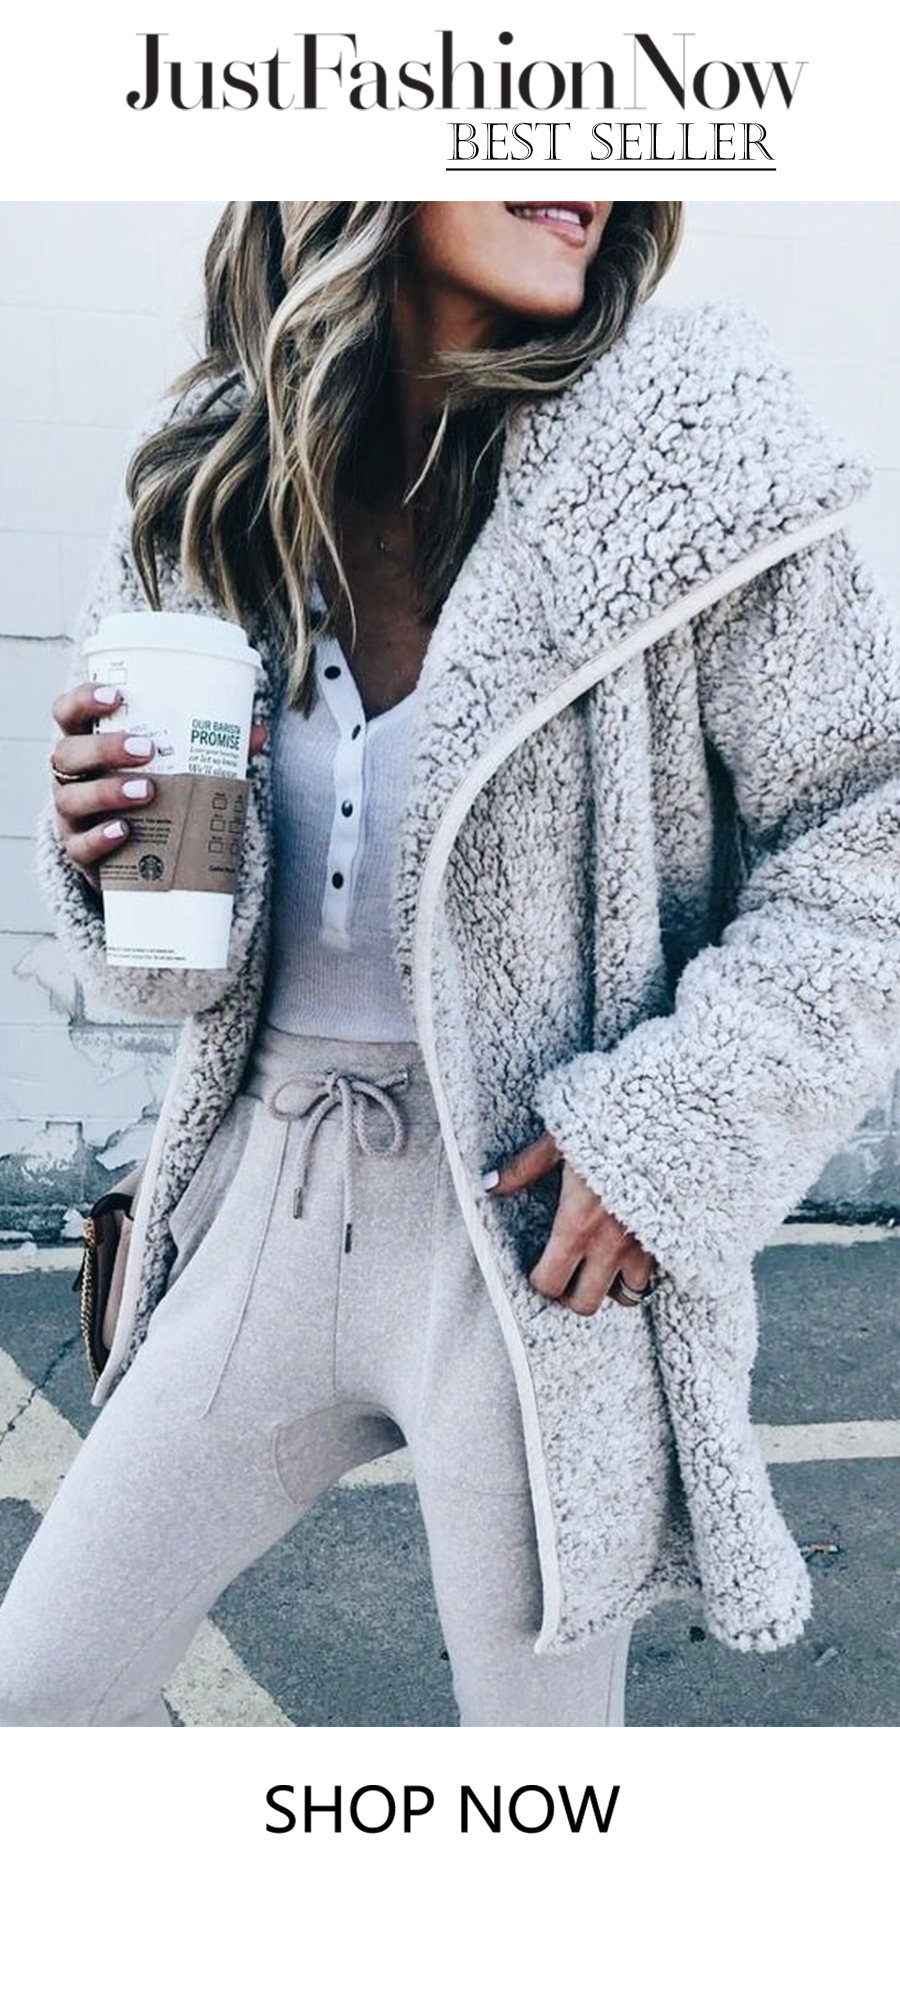 a0bcf7d73a6 Brown Buttoned Cashmere Long Sleeve Teddy Bear Coats #women's coat #fashion  #outwear